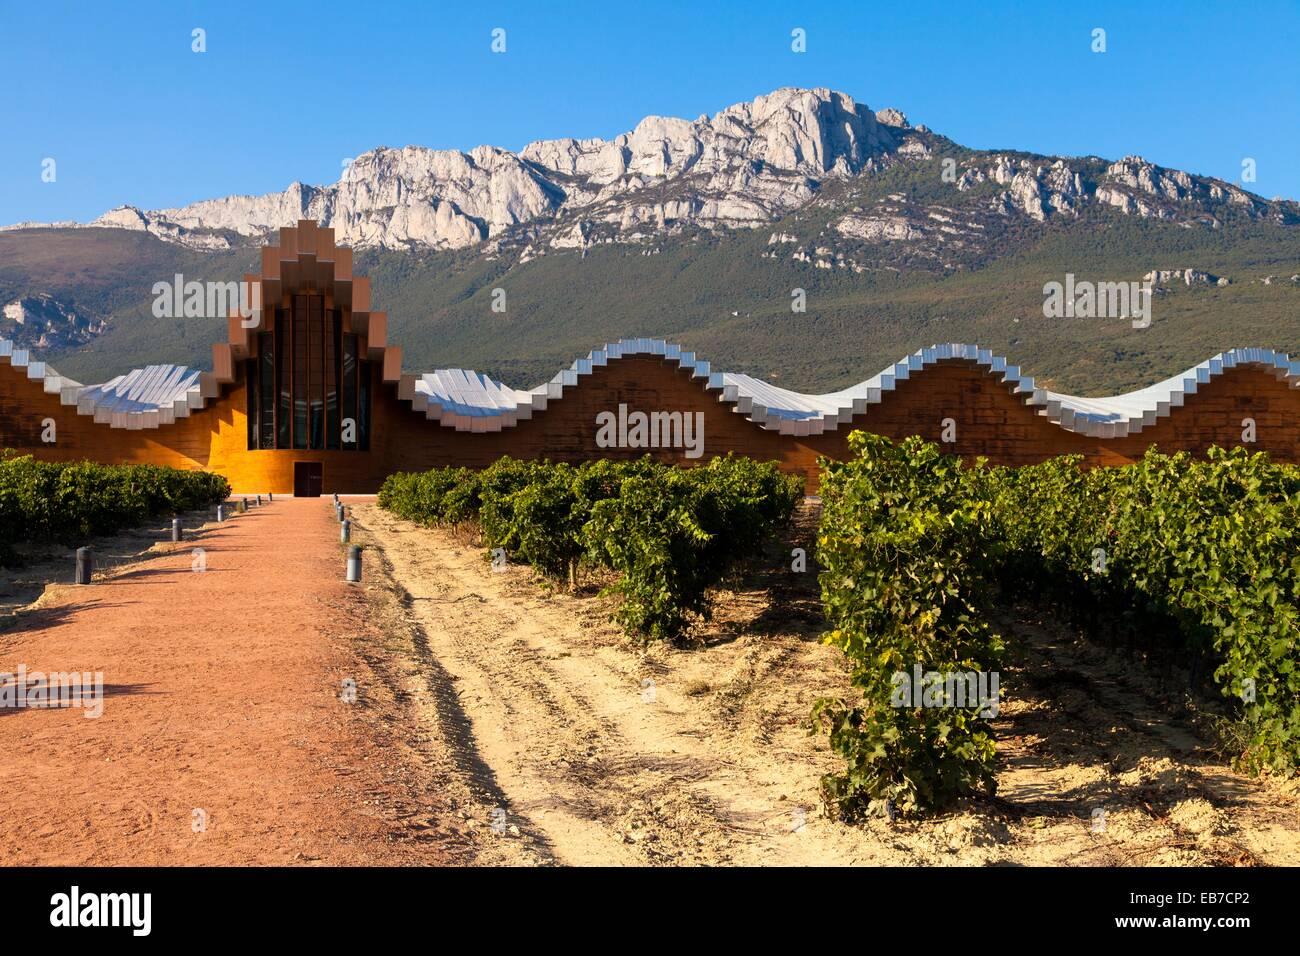 Bodegas Ysios Wine Cellar Built By Santiago Calatrava Laguardia